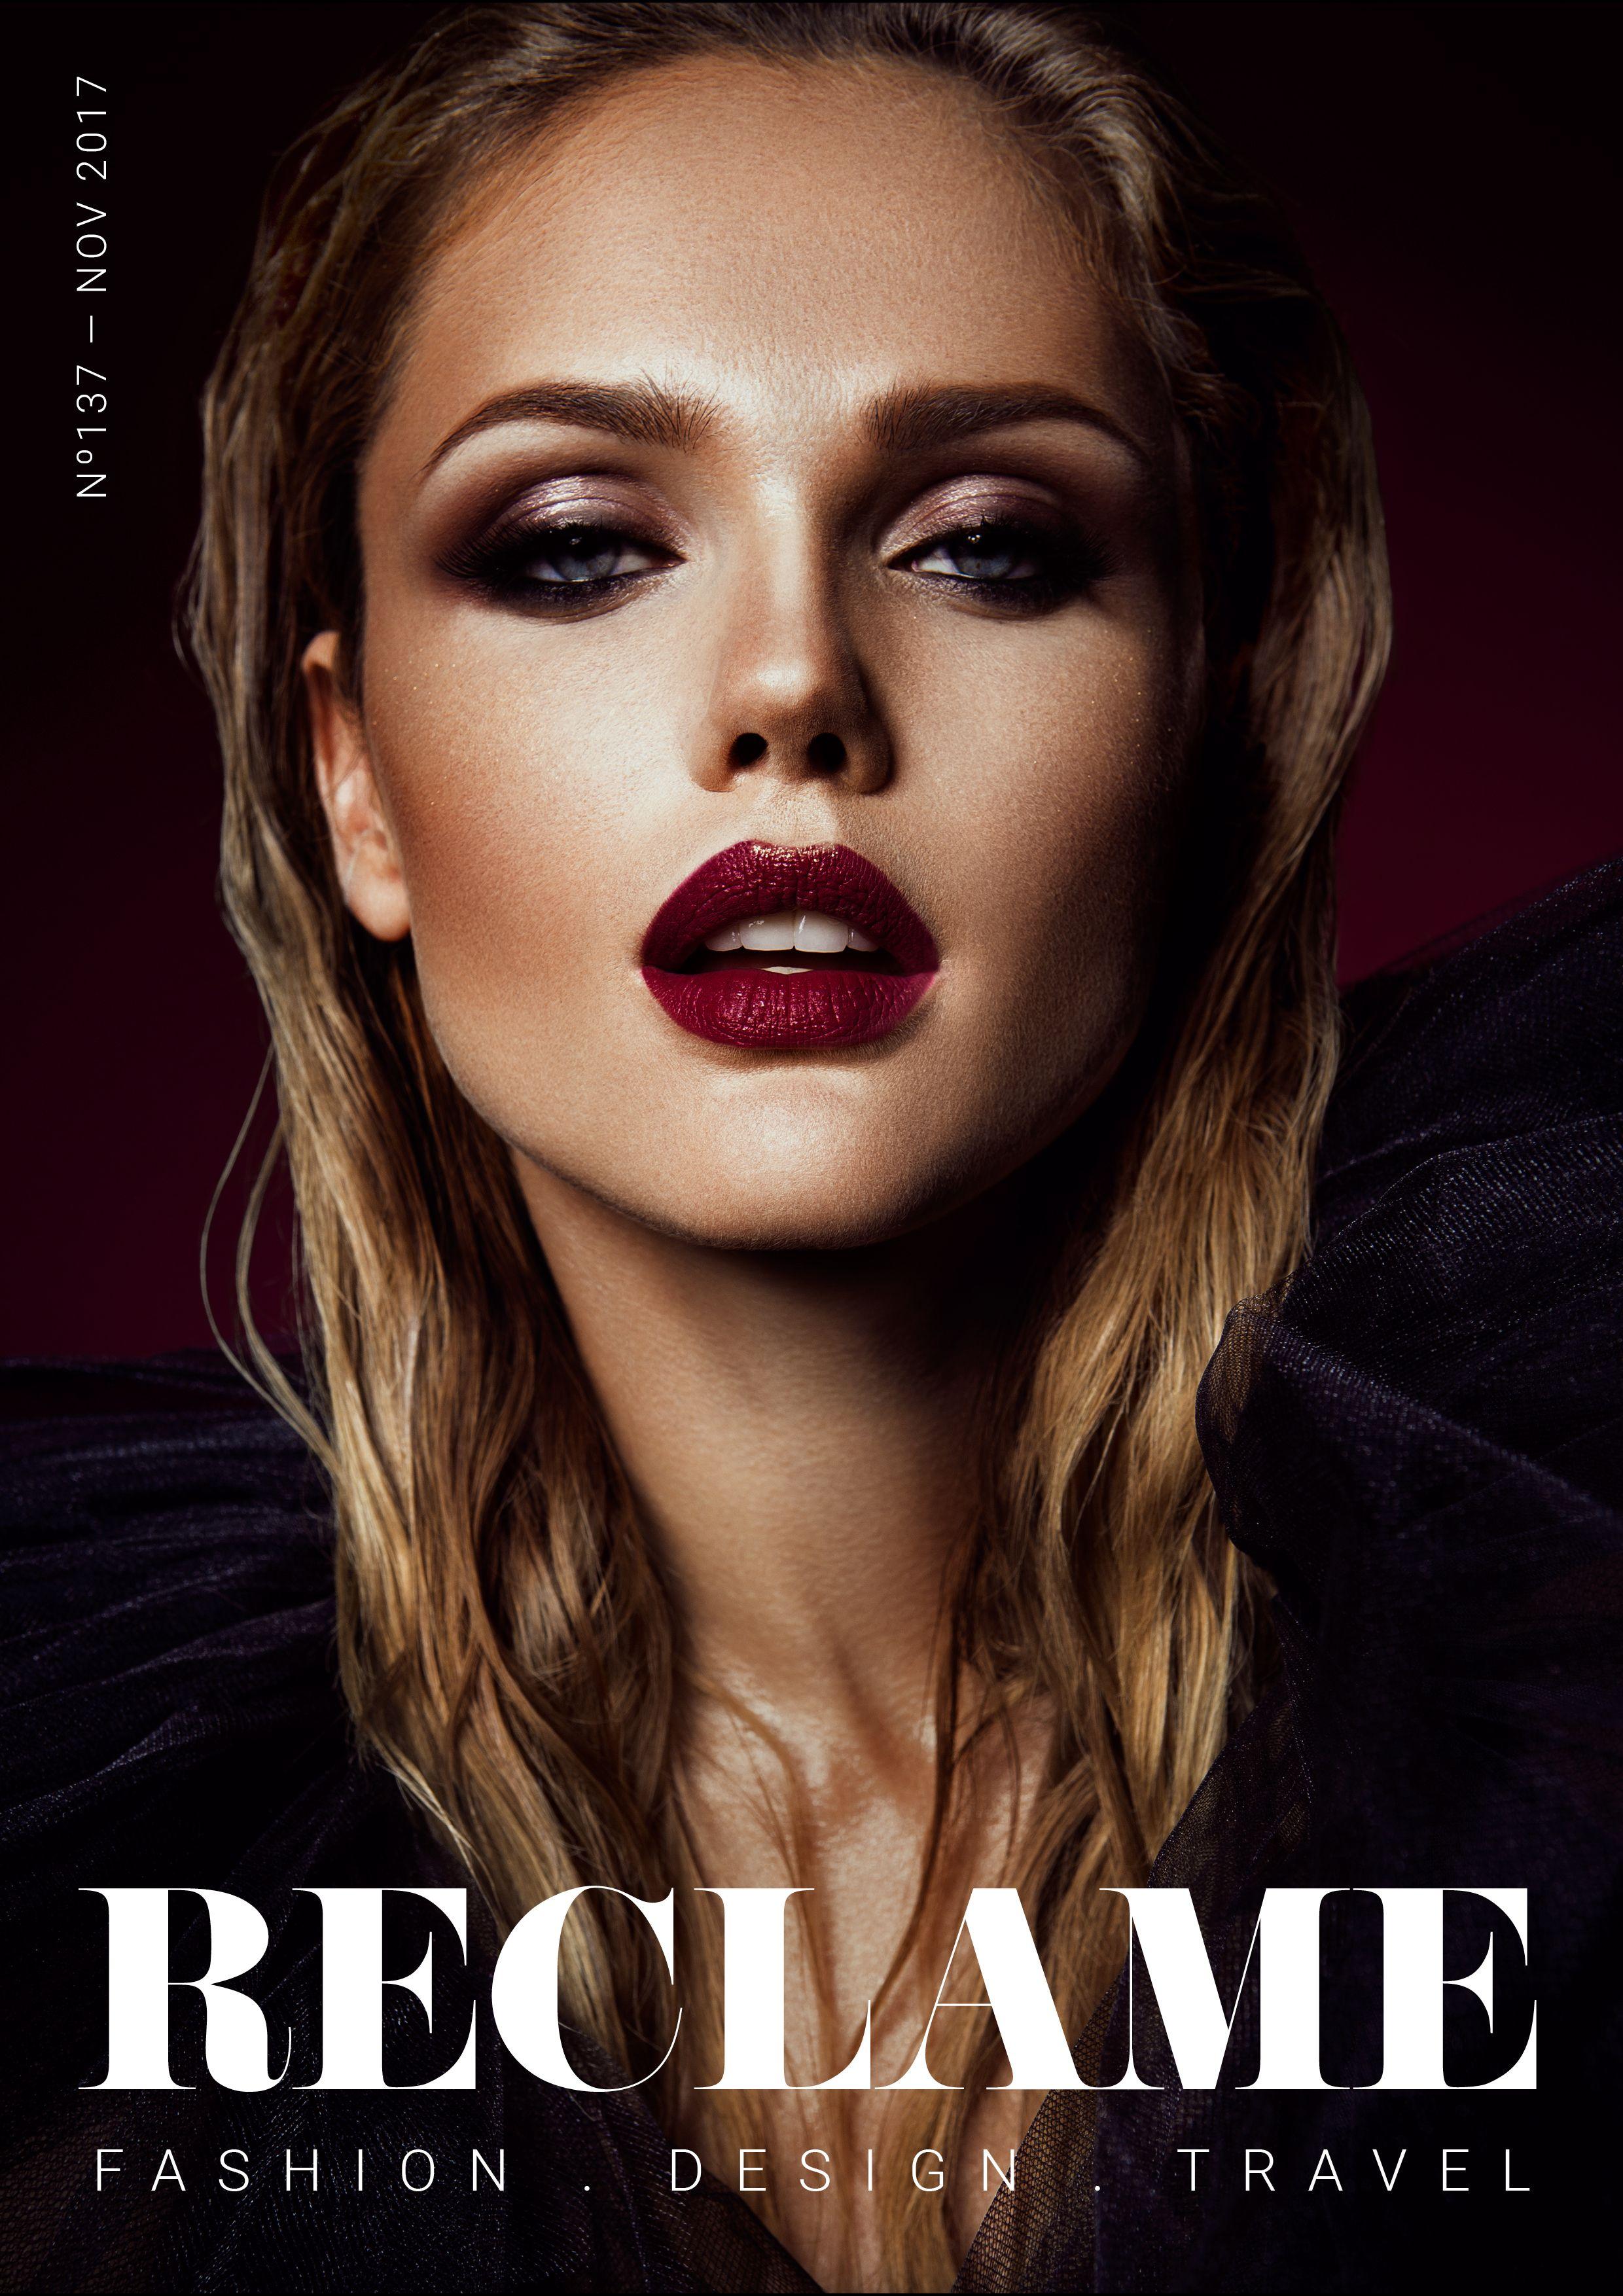 RECLAME Magazine Mode N°137 Glamour fotografie